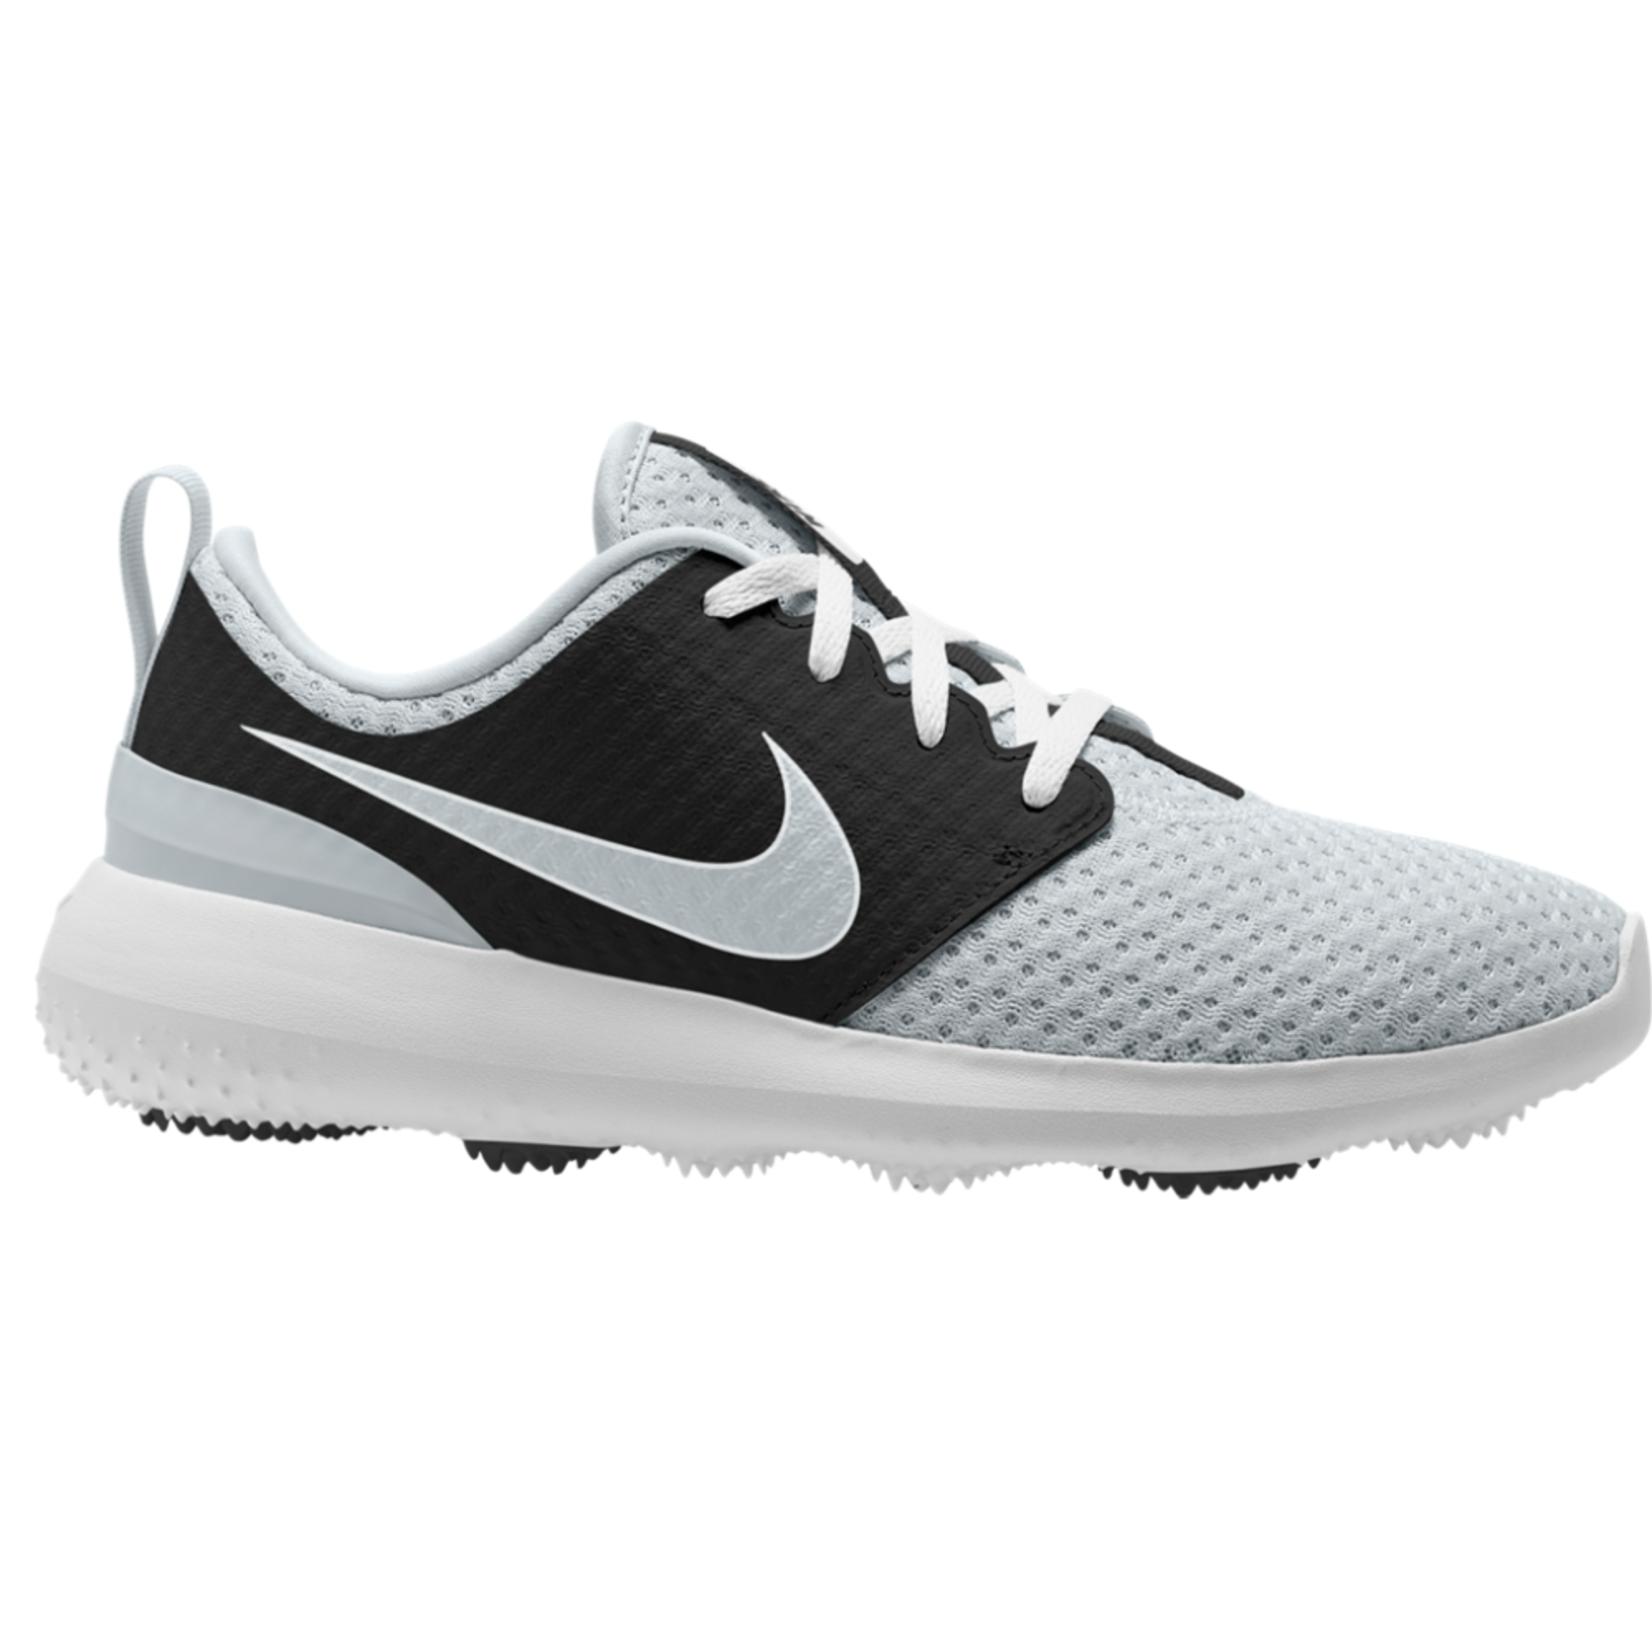 Nike Nike Roshe G Wmns Golf Shoe (21)